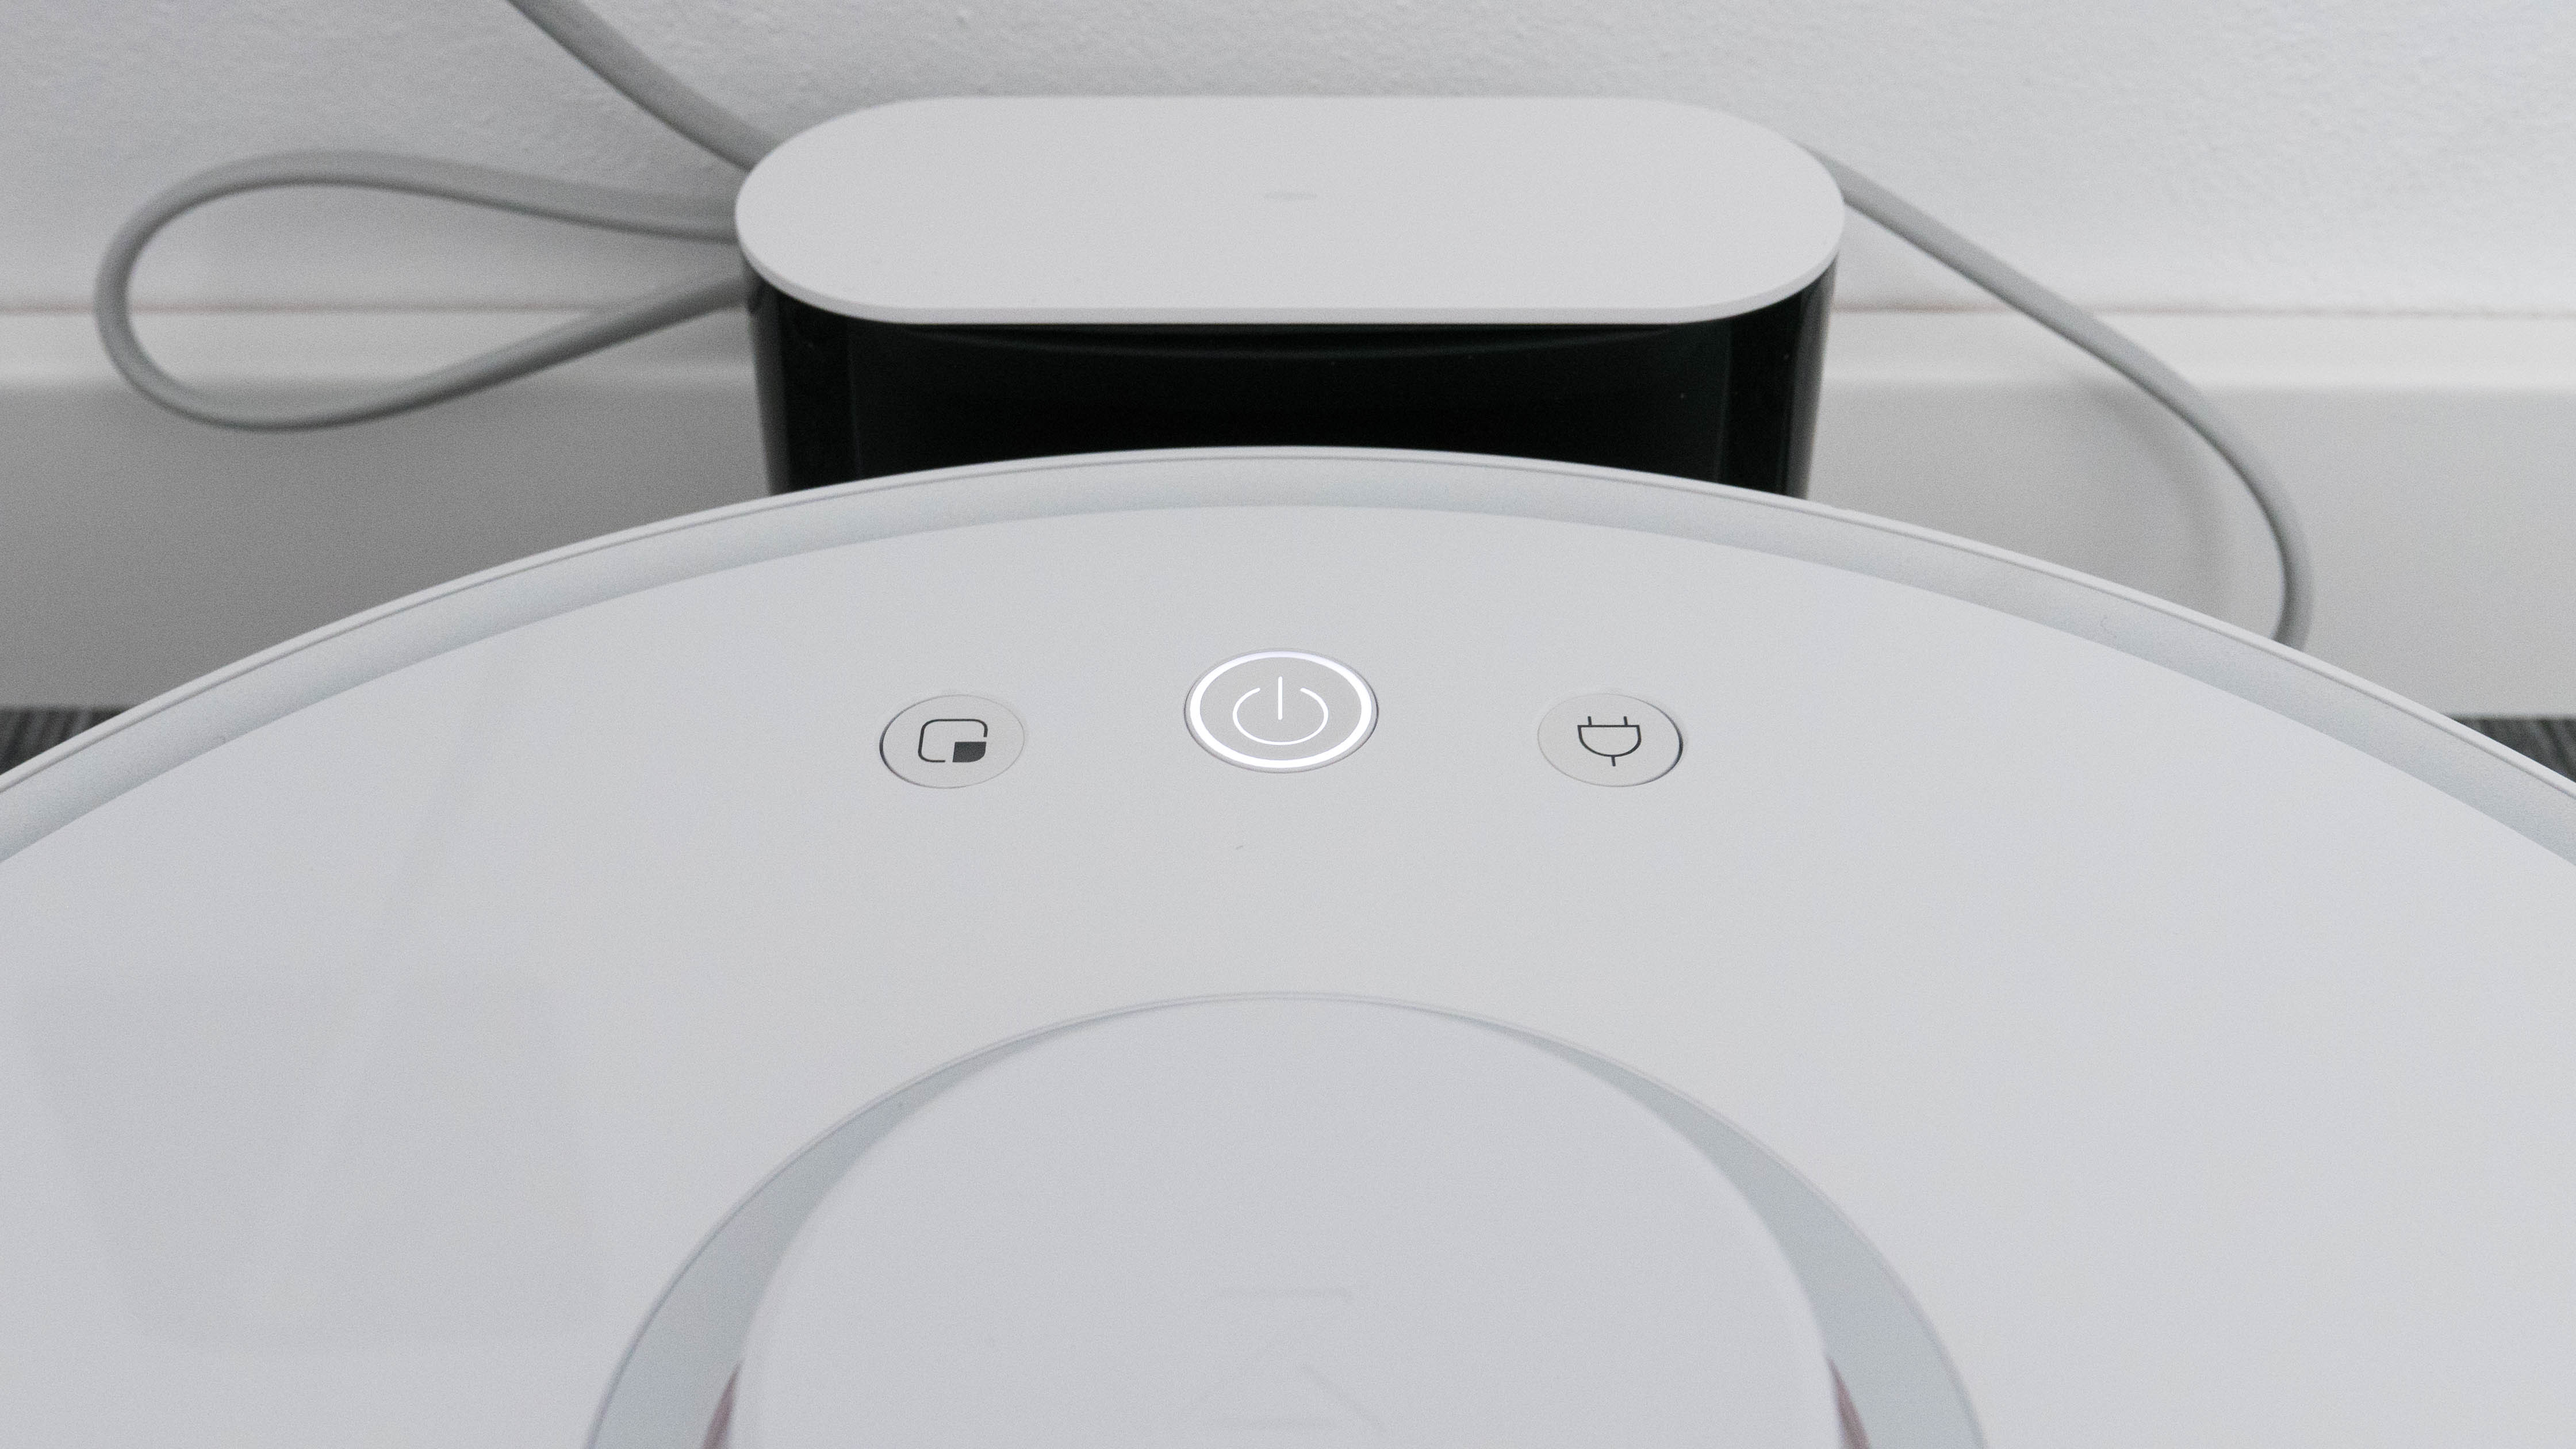 Xiaomi Mi Robot 2 Roborock S50 Roboter Details 4